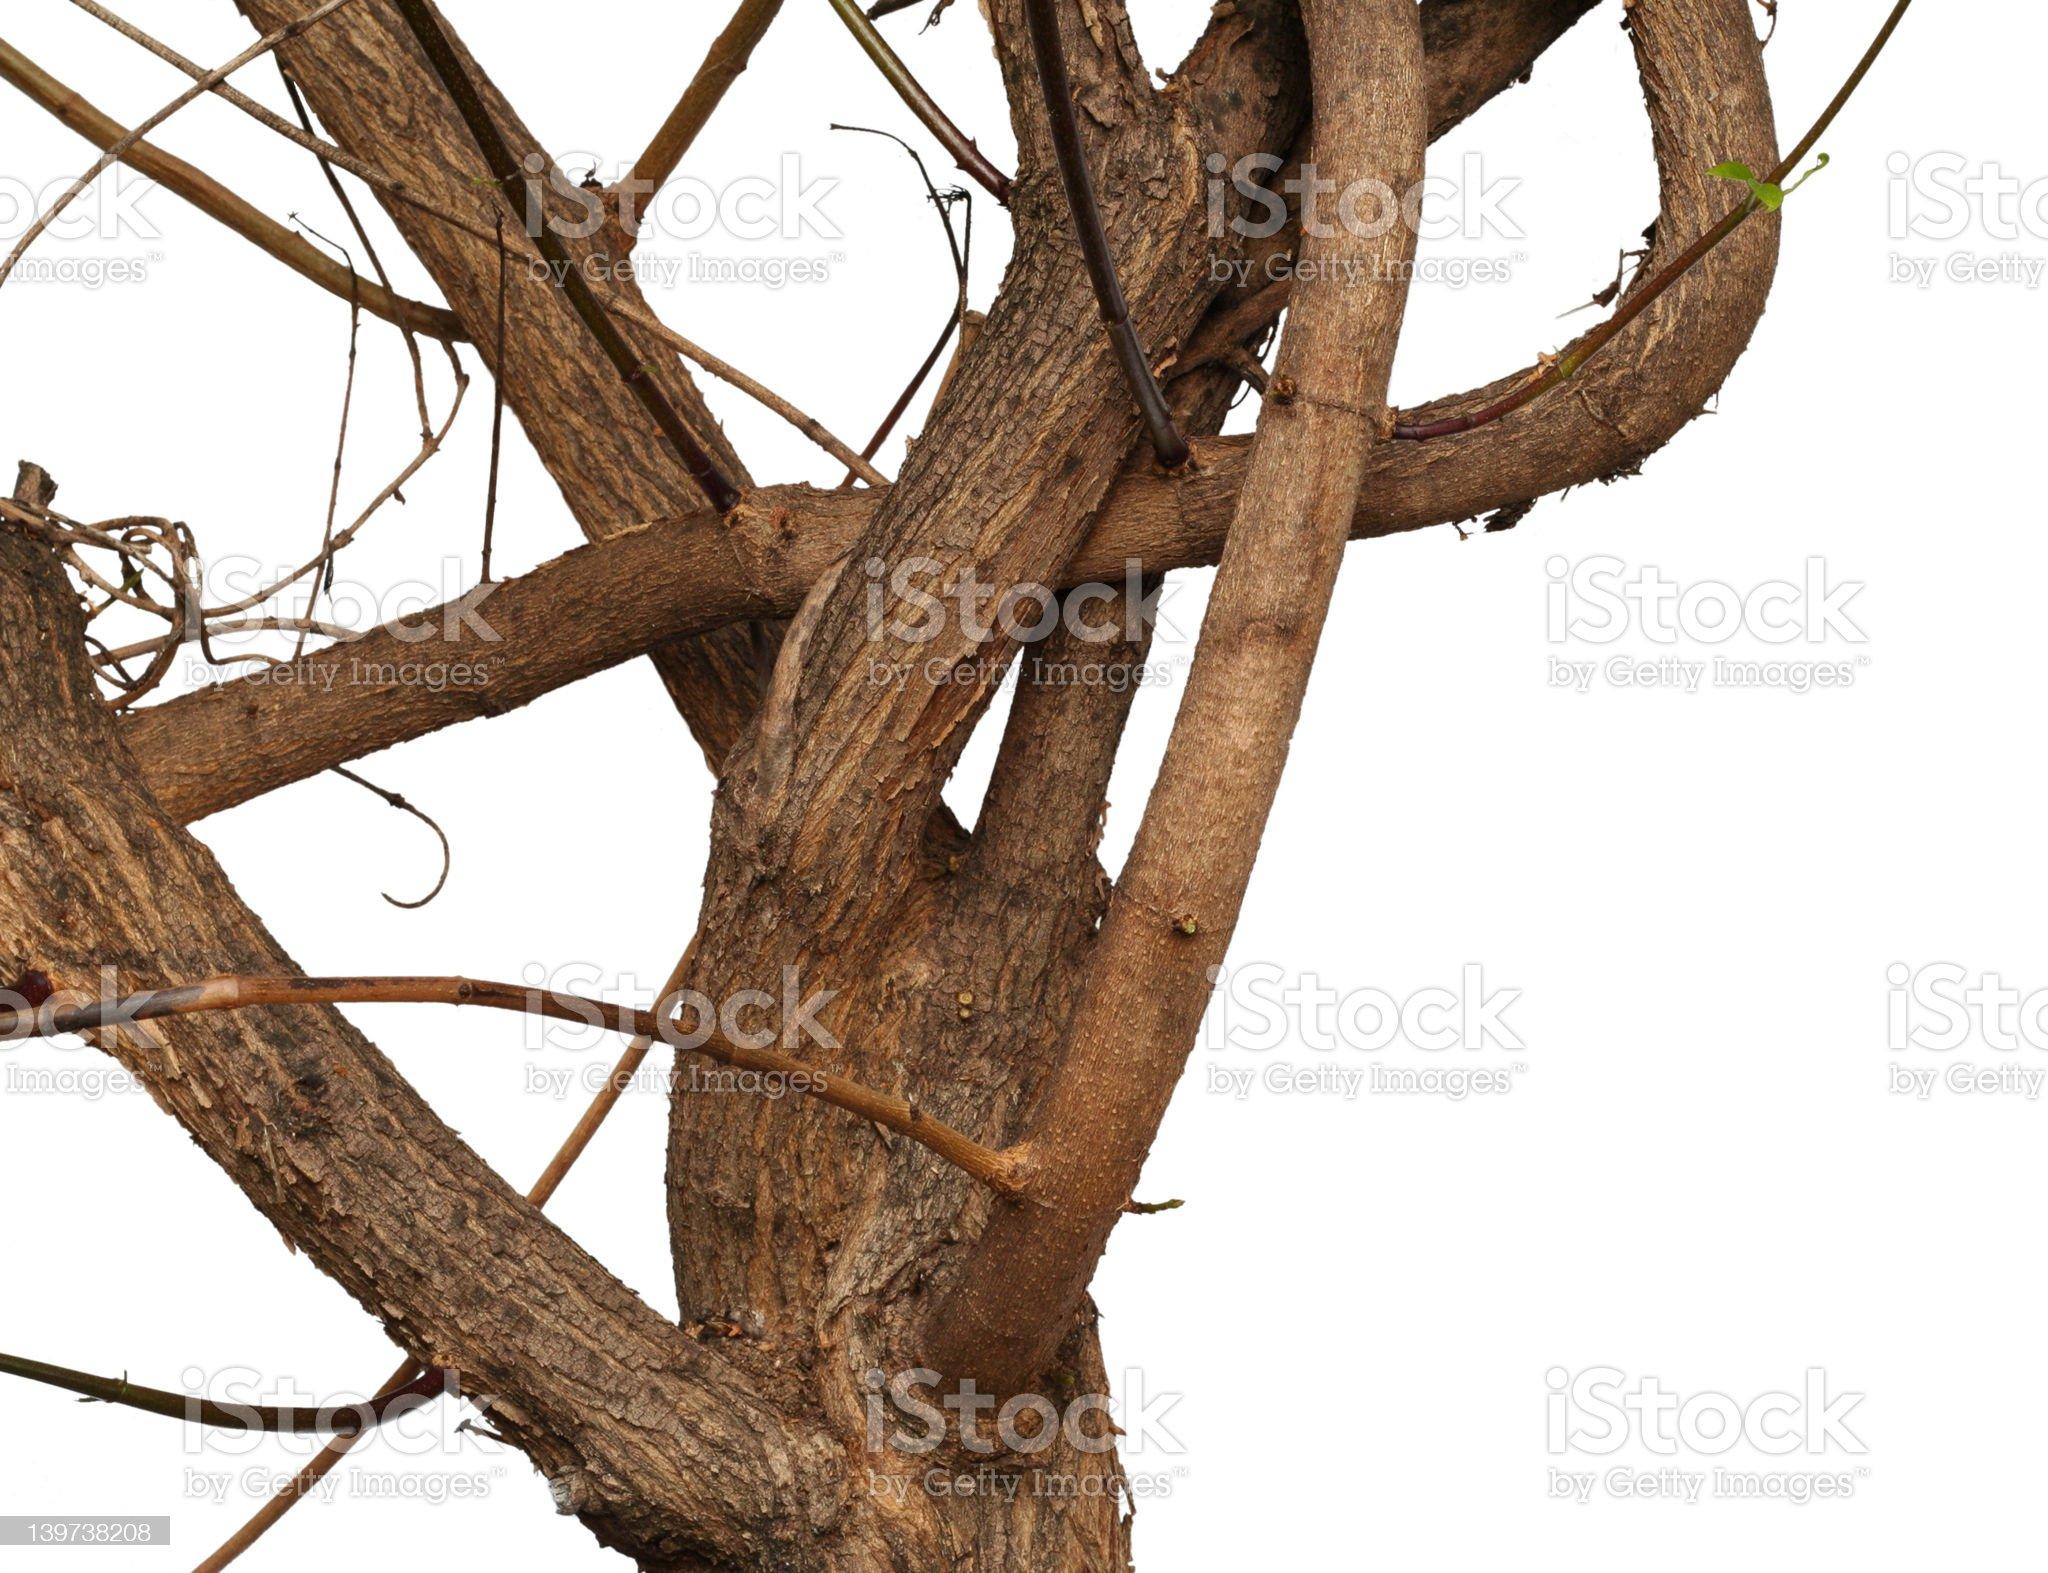 Twisty branch royalty-free stock photo